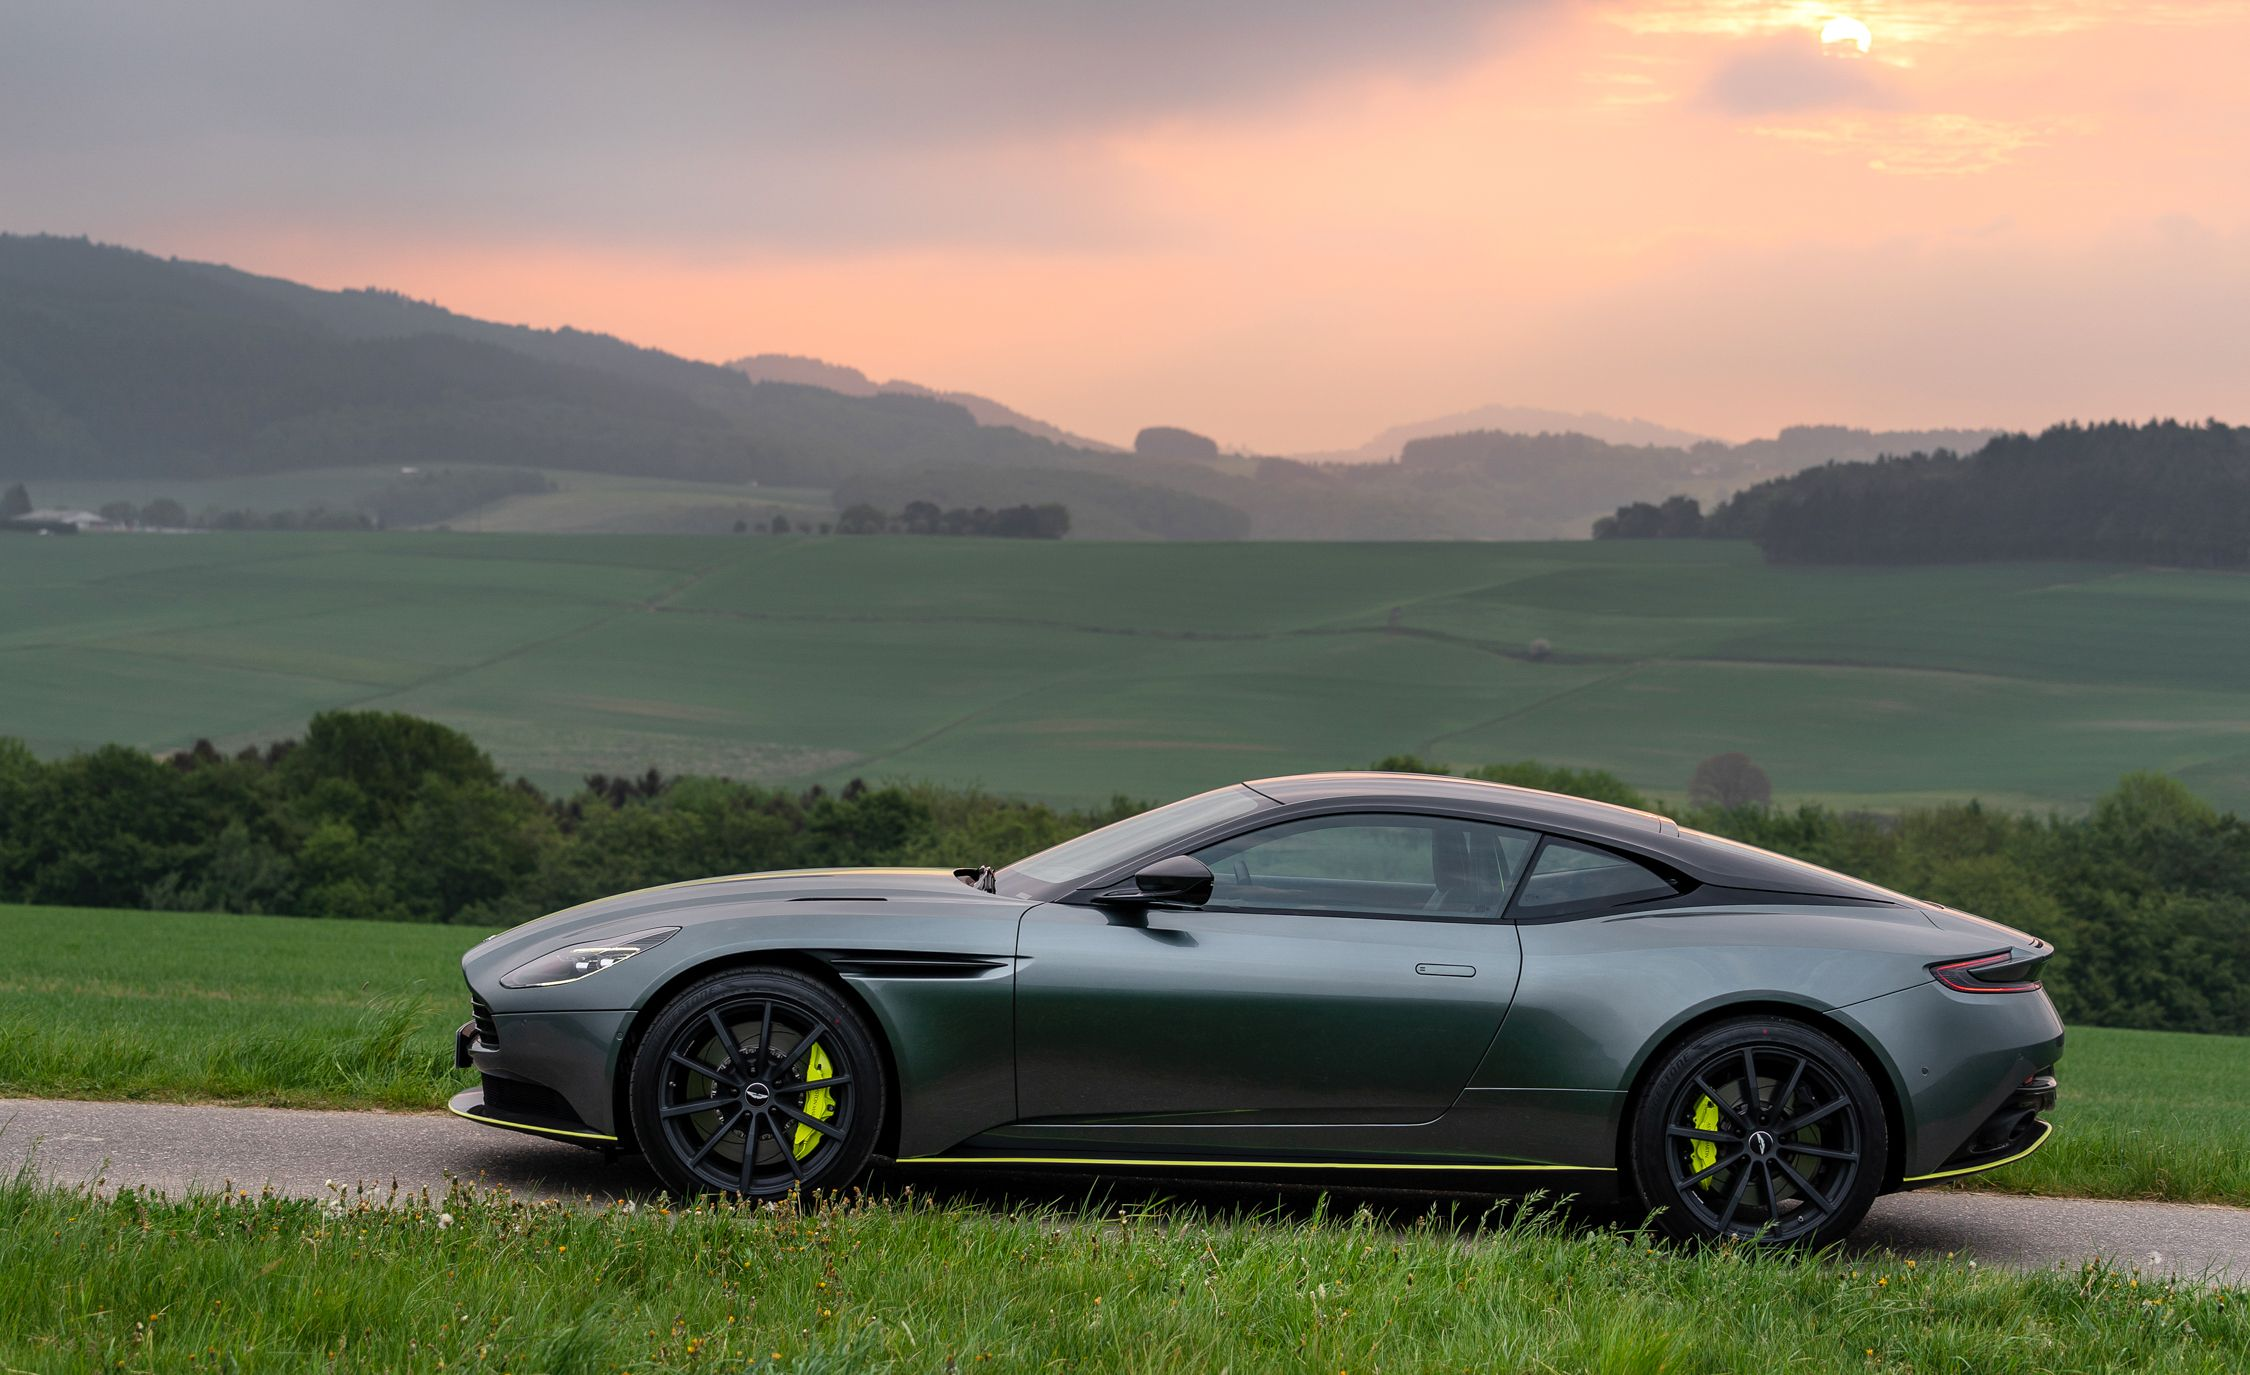 2019 Aston Martin Db11 Reviews Aston Martin Db11 Price Photos